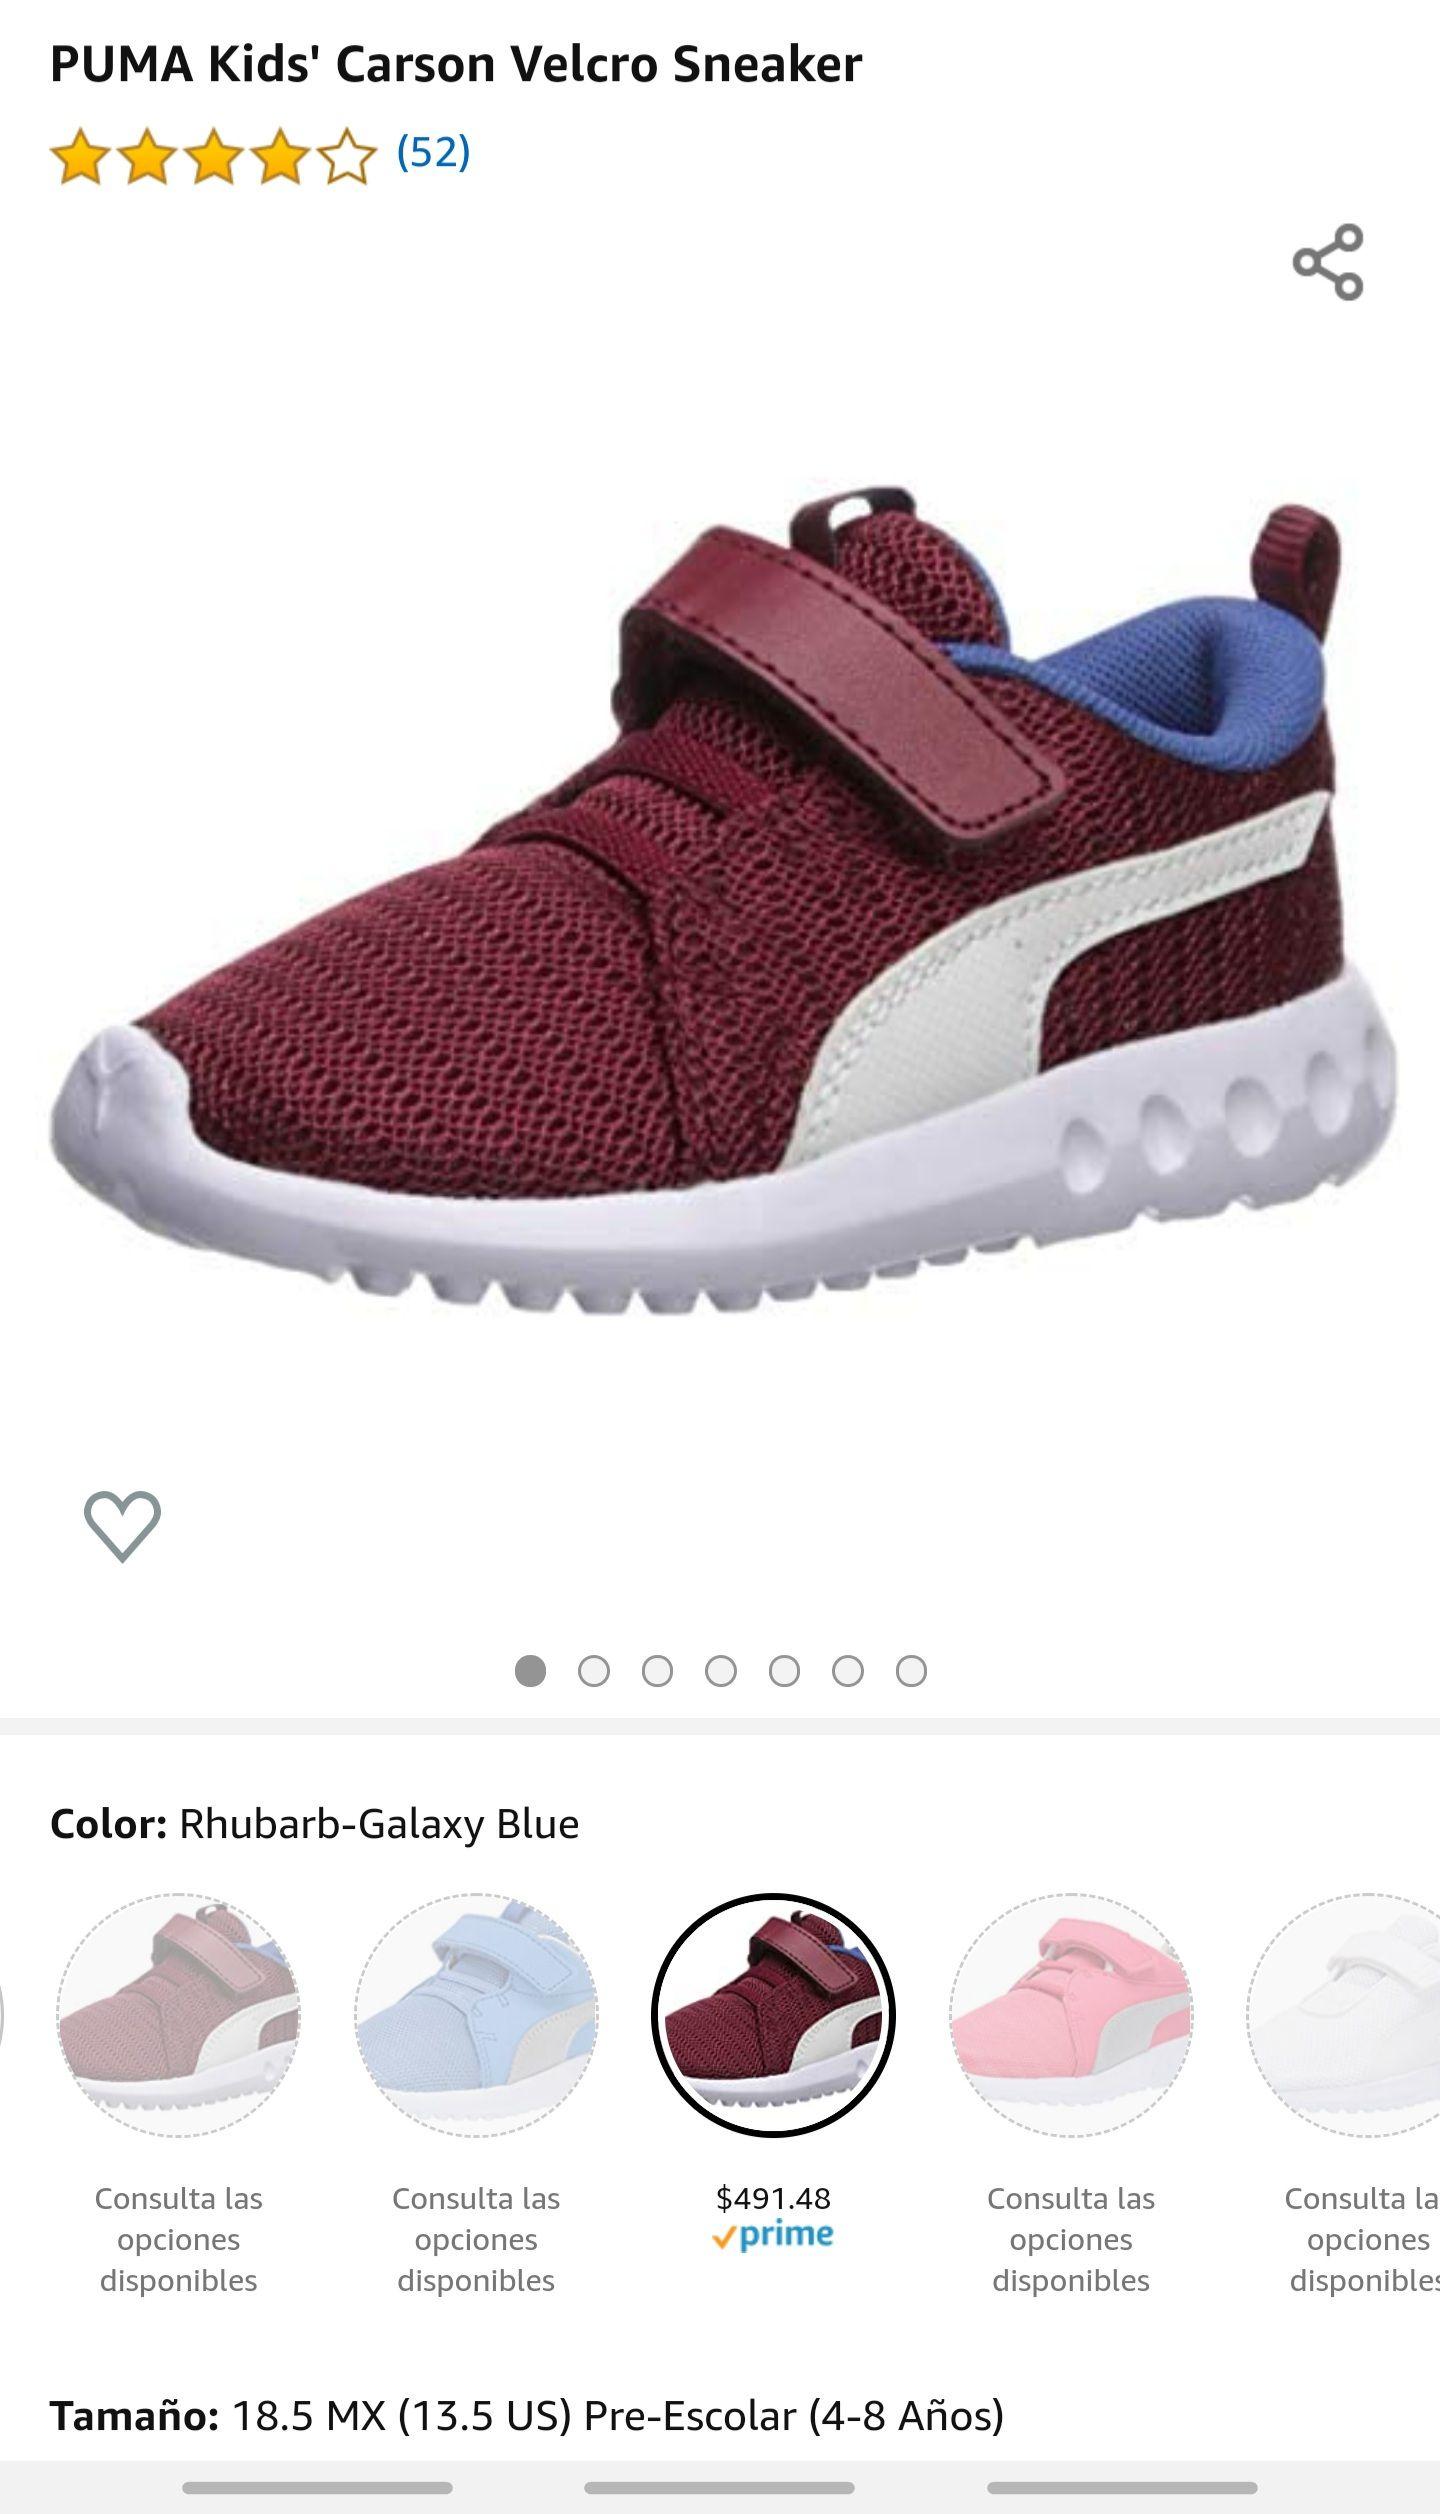 Amazon: PUMA Kids' Carson Velcro Sneakers Envio gratis con Prime